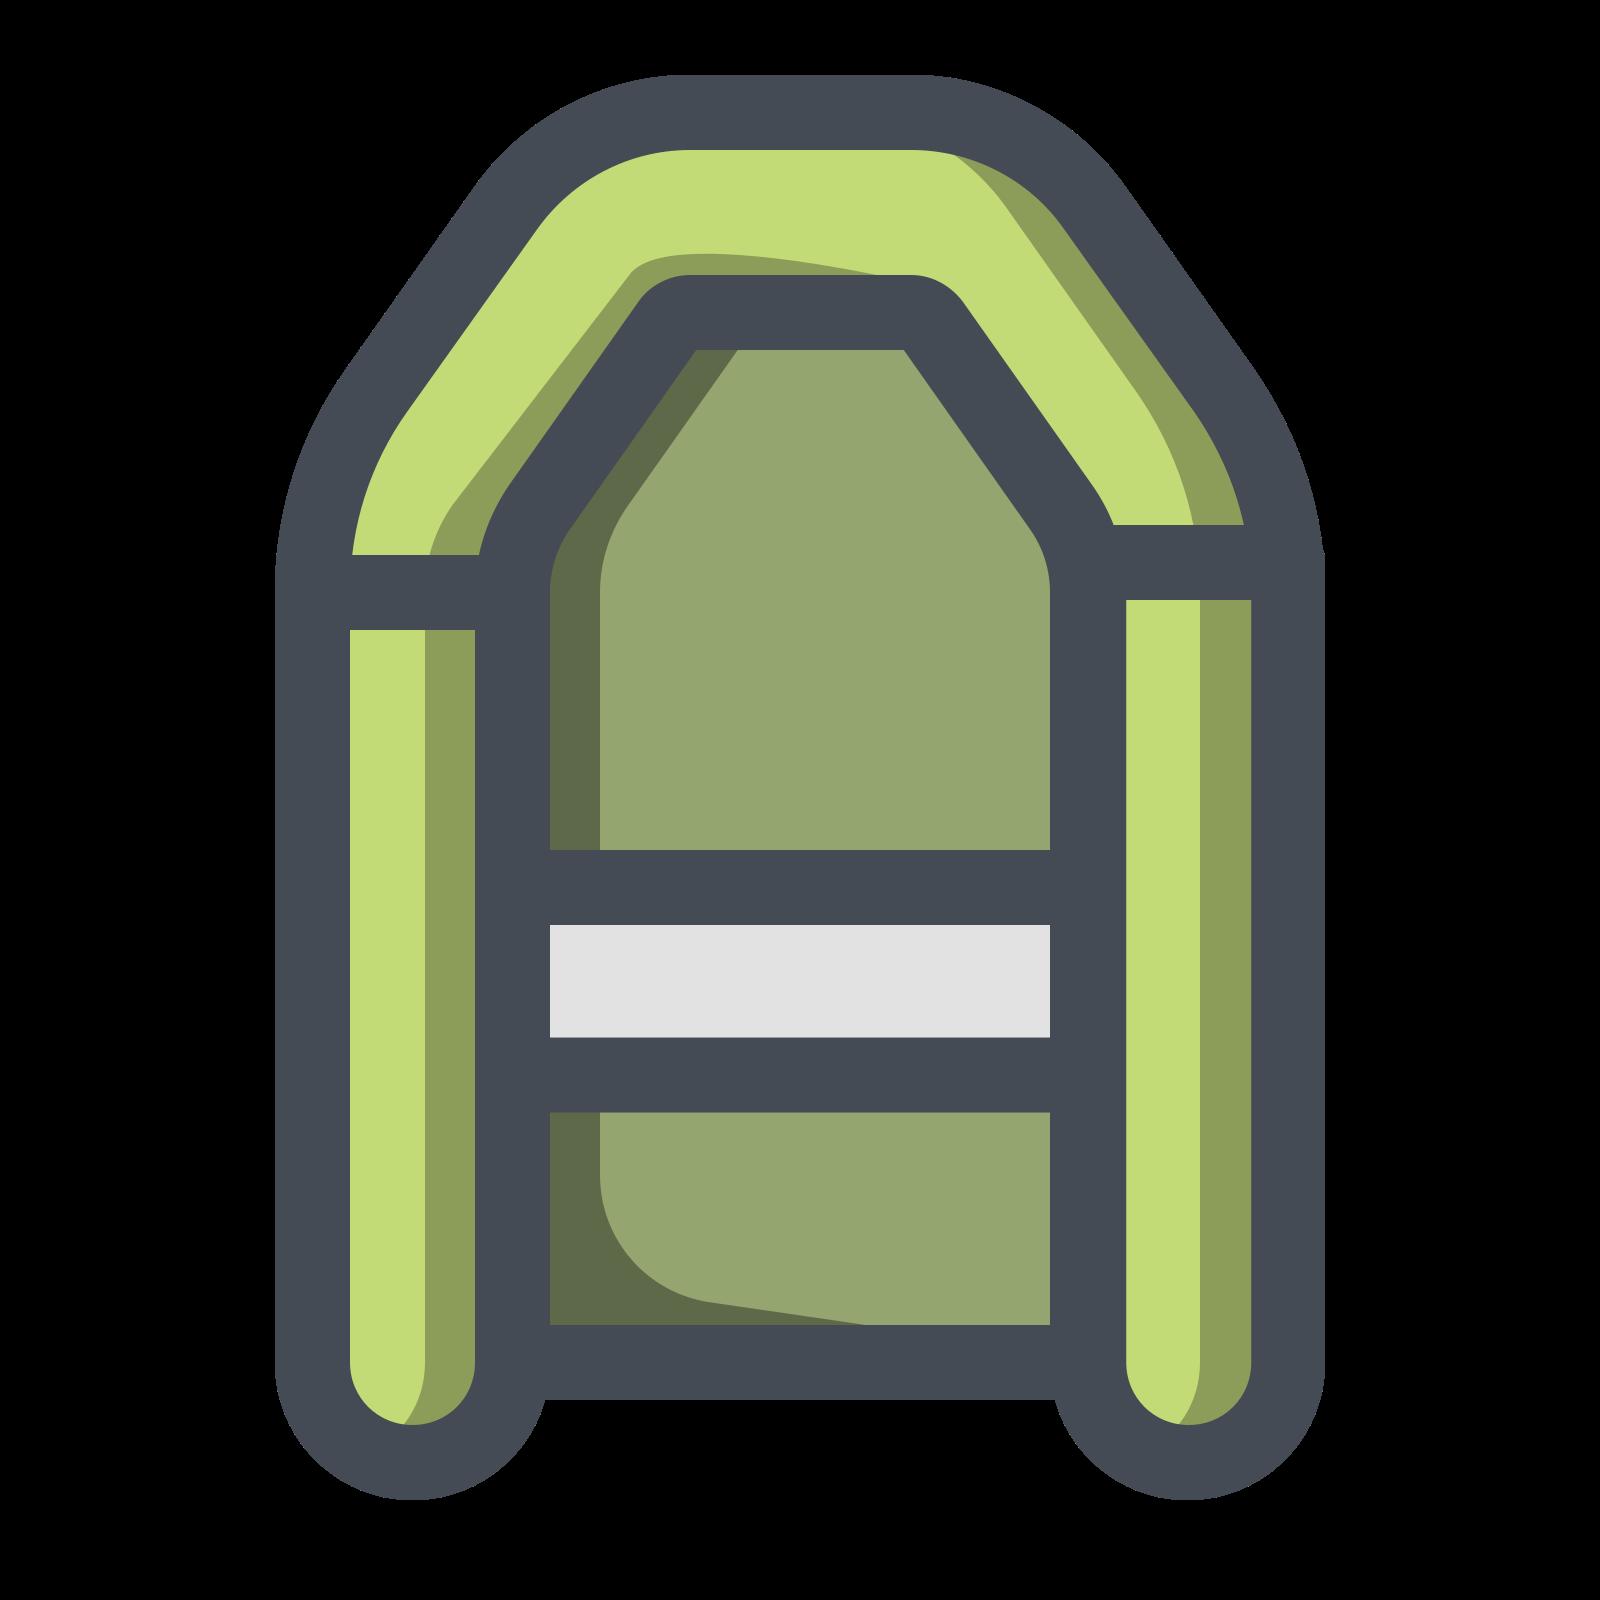 Green Rubber Boat icon